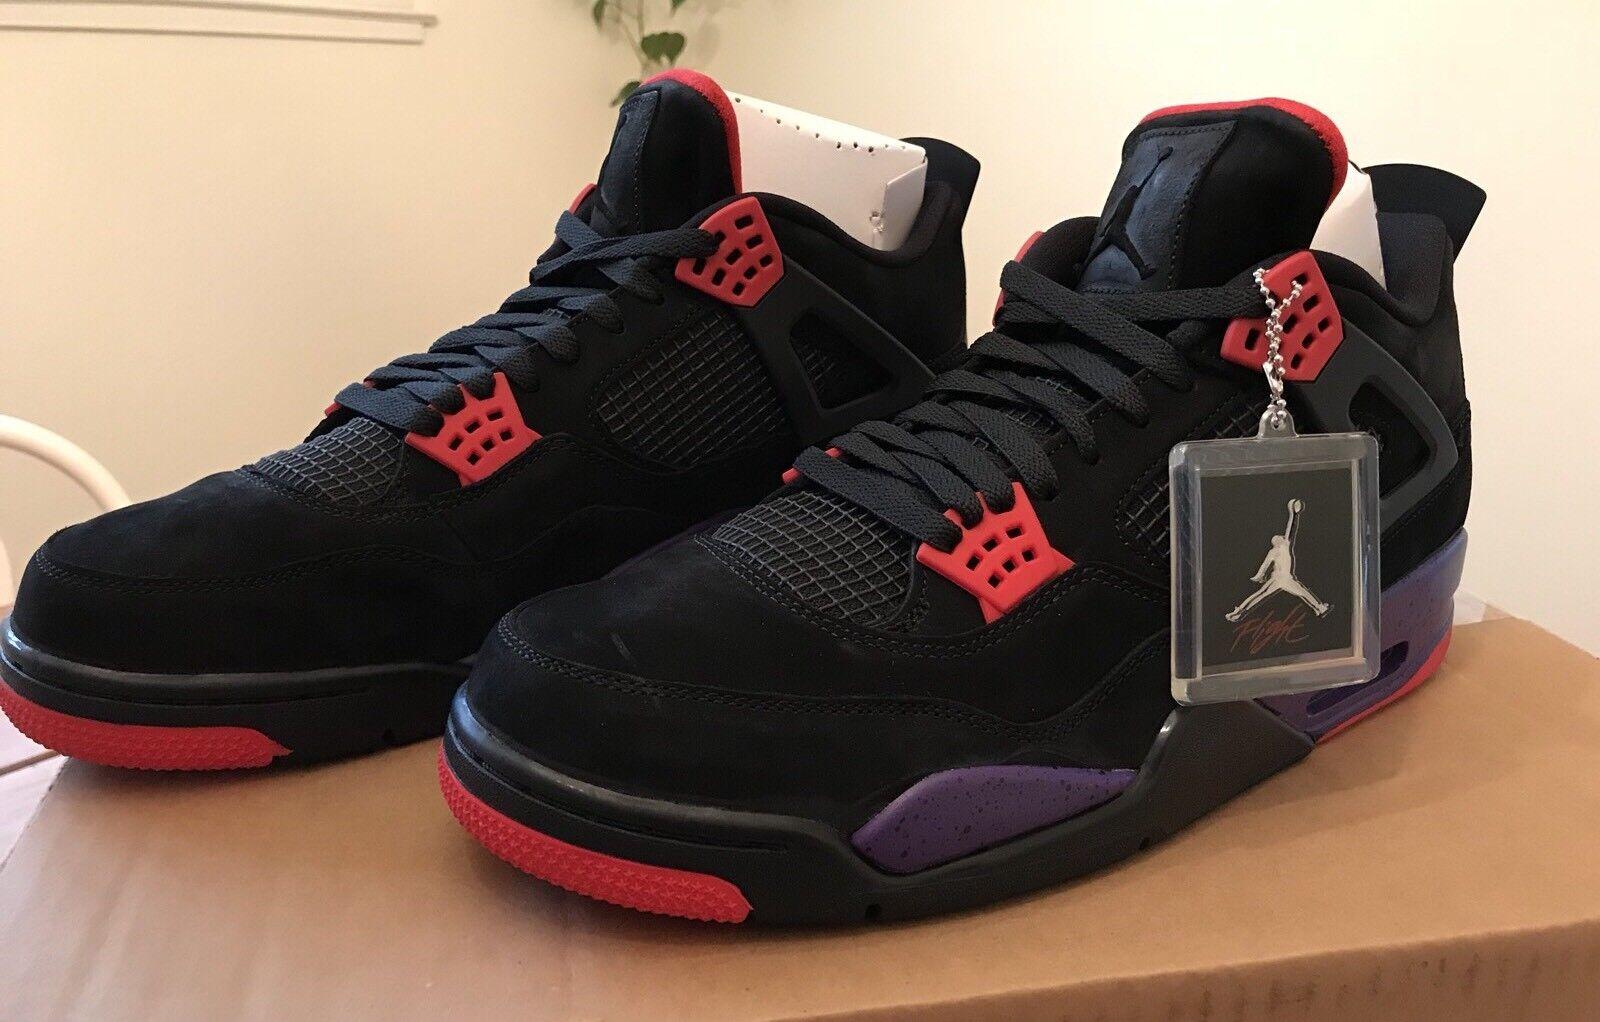 timeless design 08806 cce2e 2018 NIKE AIR JORDAN RETRO RETRO RETRO NRG Black Court Purple Size 14 Brand  NEW in